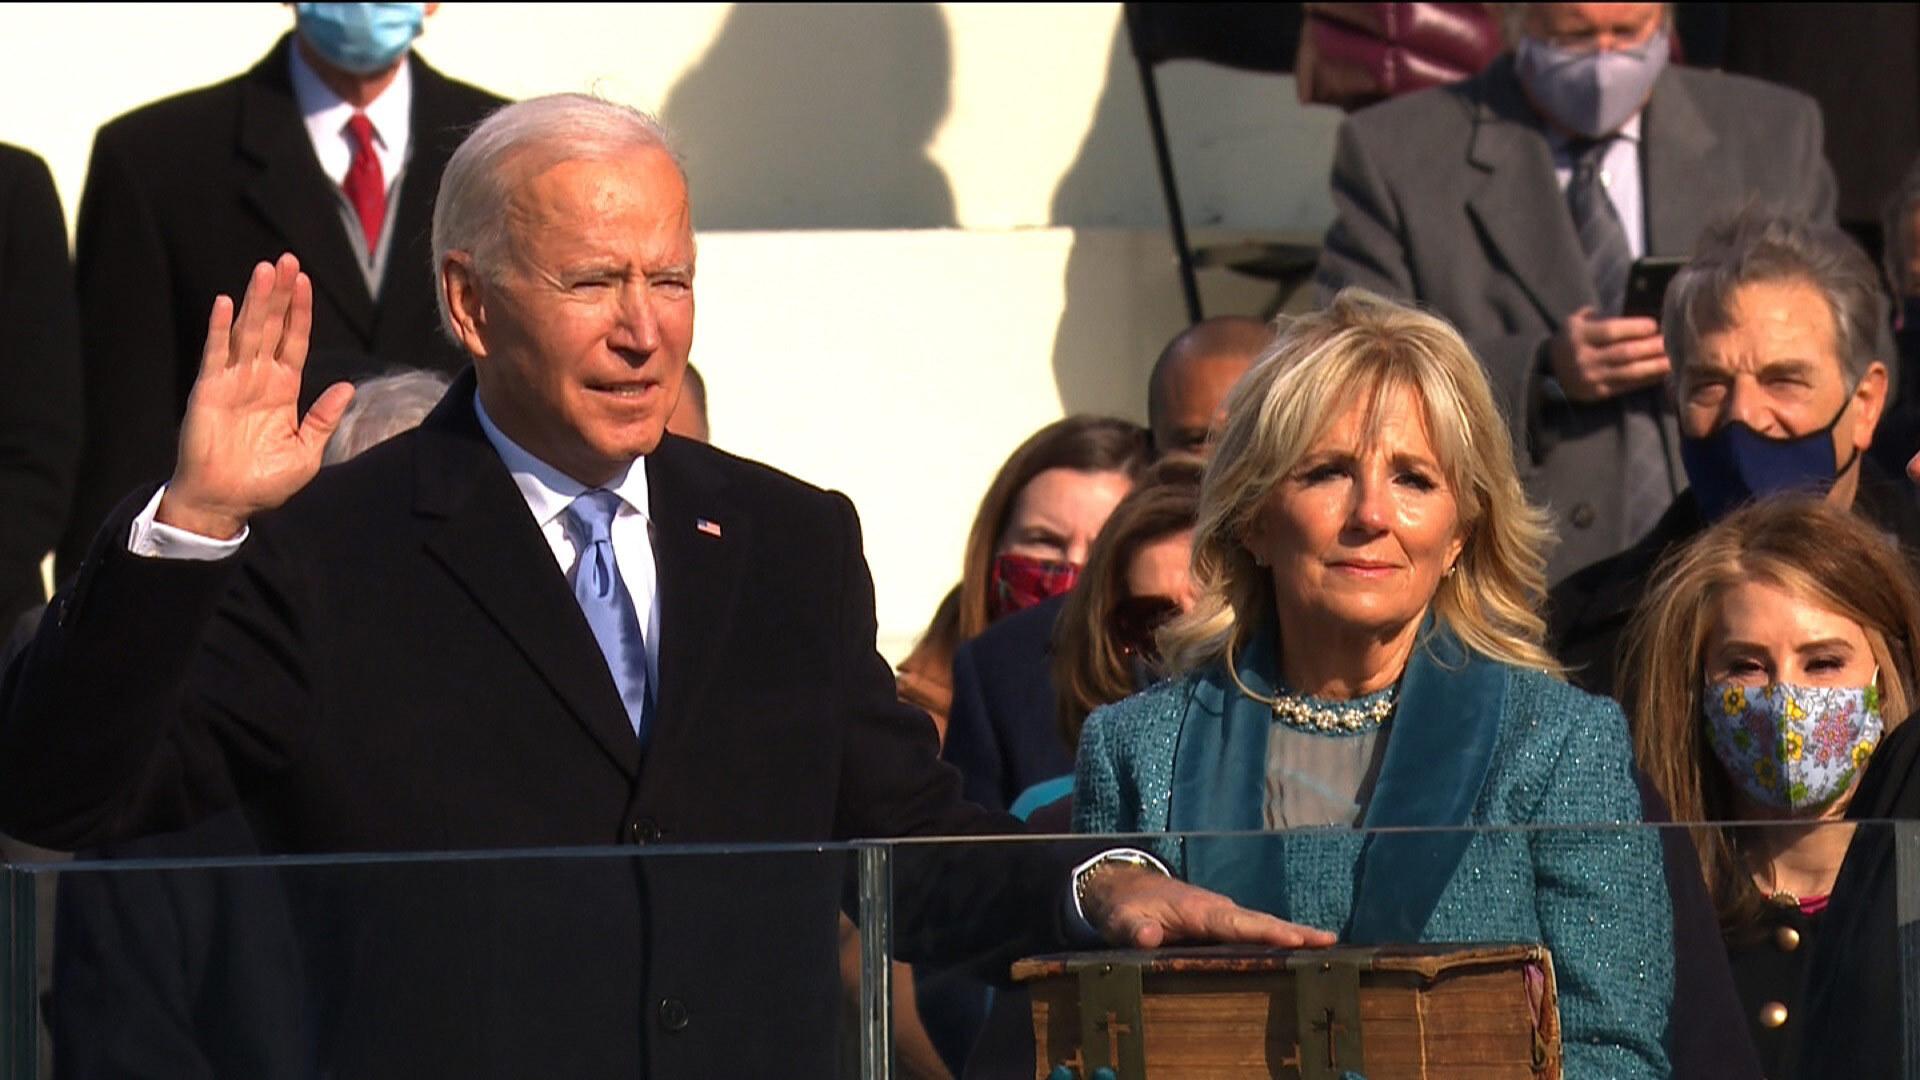 Joseph R. Biden Jr. has been sworn in as America's 46th president 0d7b8024-7a6a-423f-bbe5-35a9387d96bf